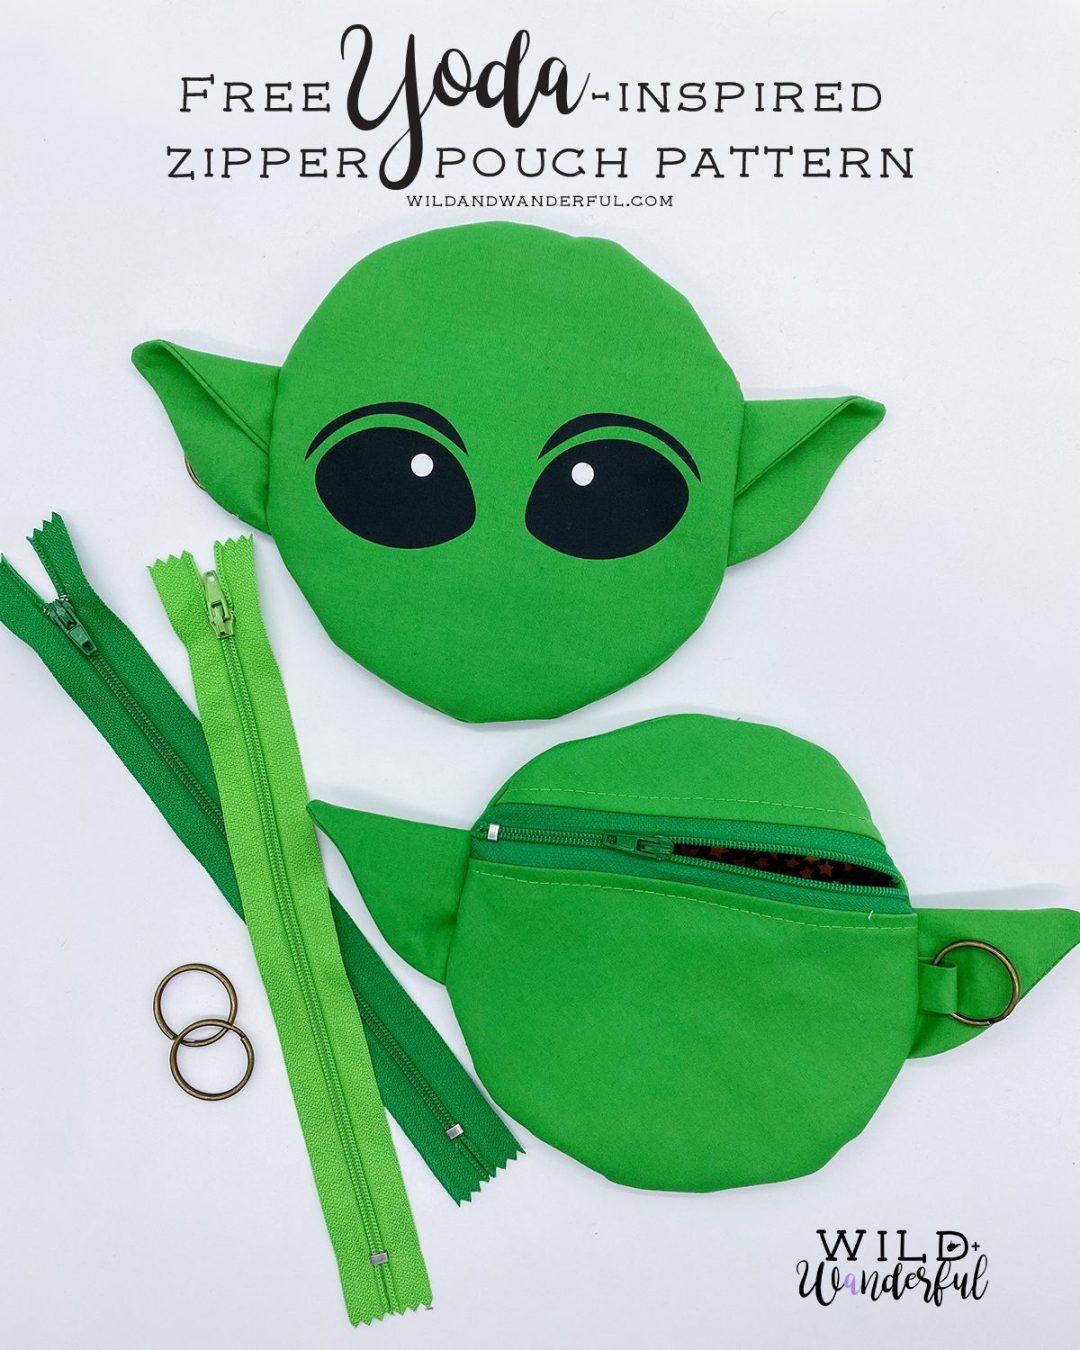 Yoda One for Me :: FREE Yoda-Inspired Zipper Pouch Pattern + Tutorial!